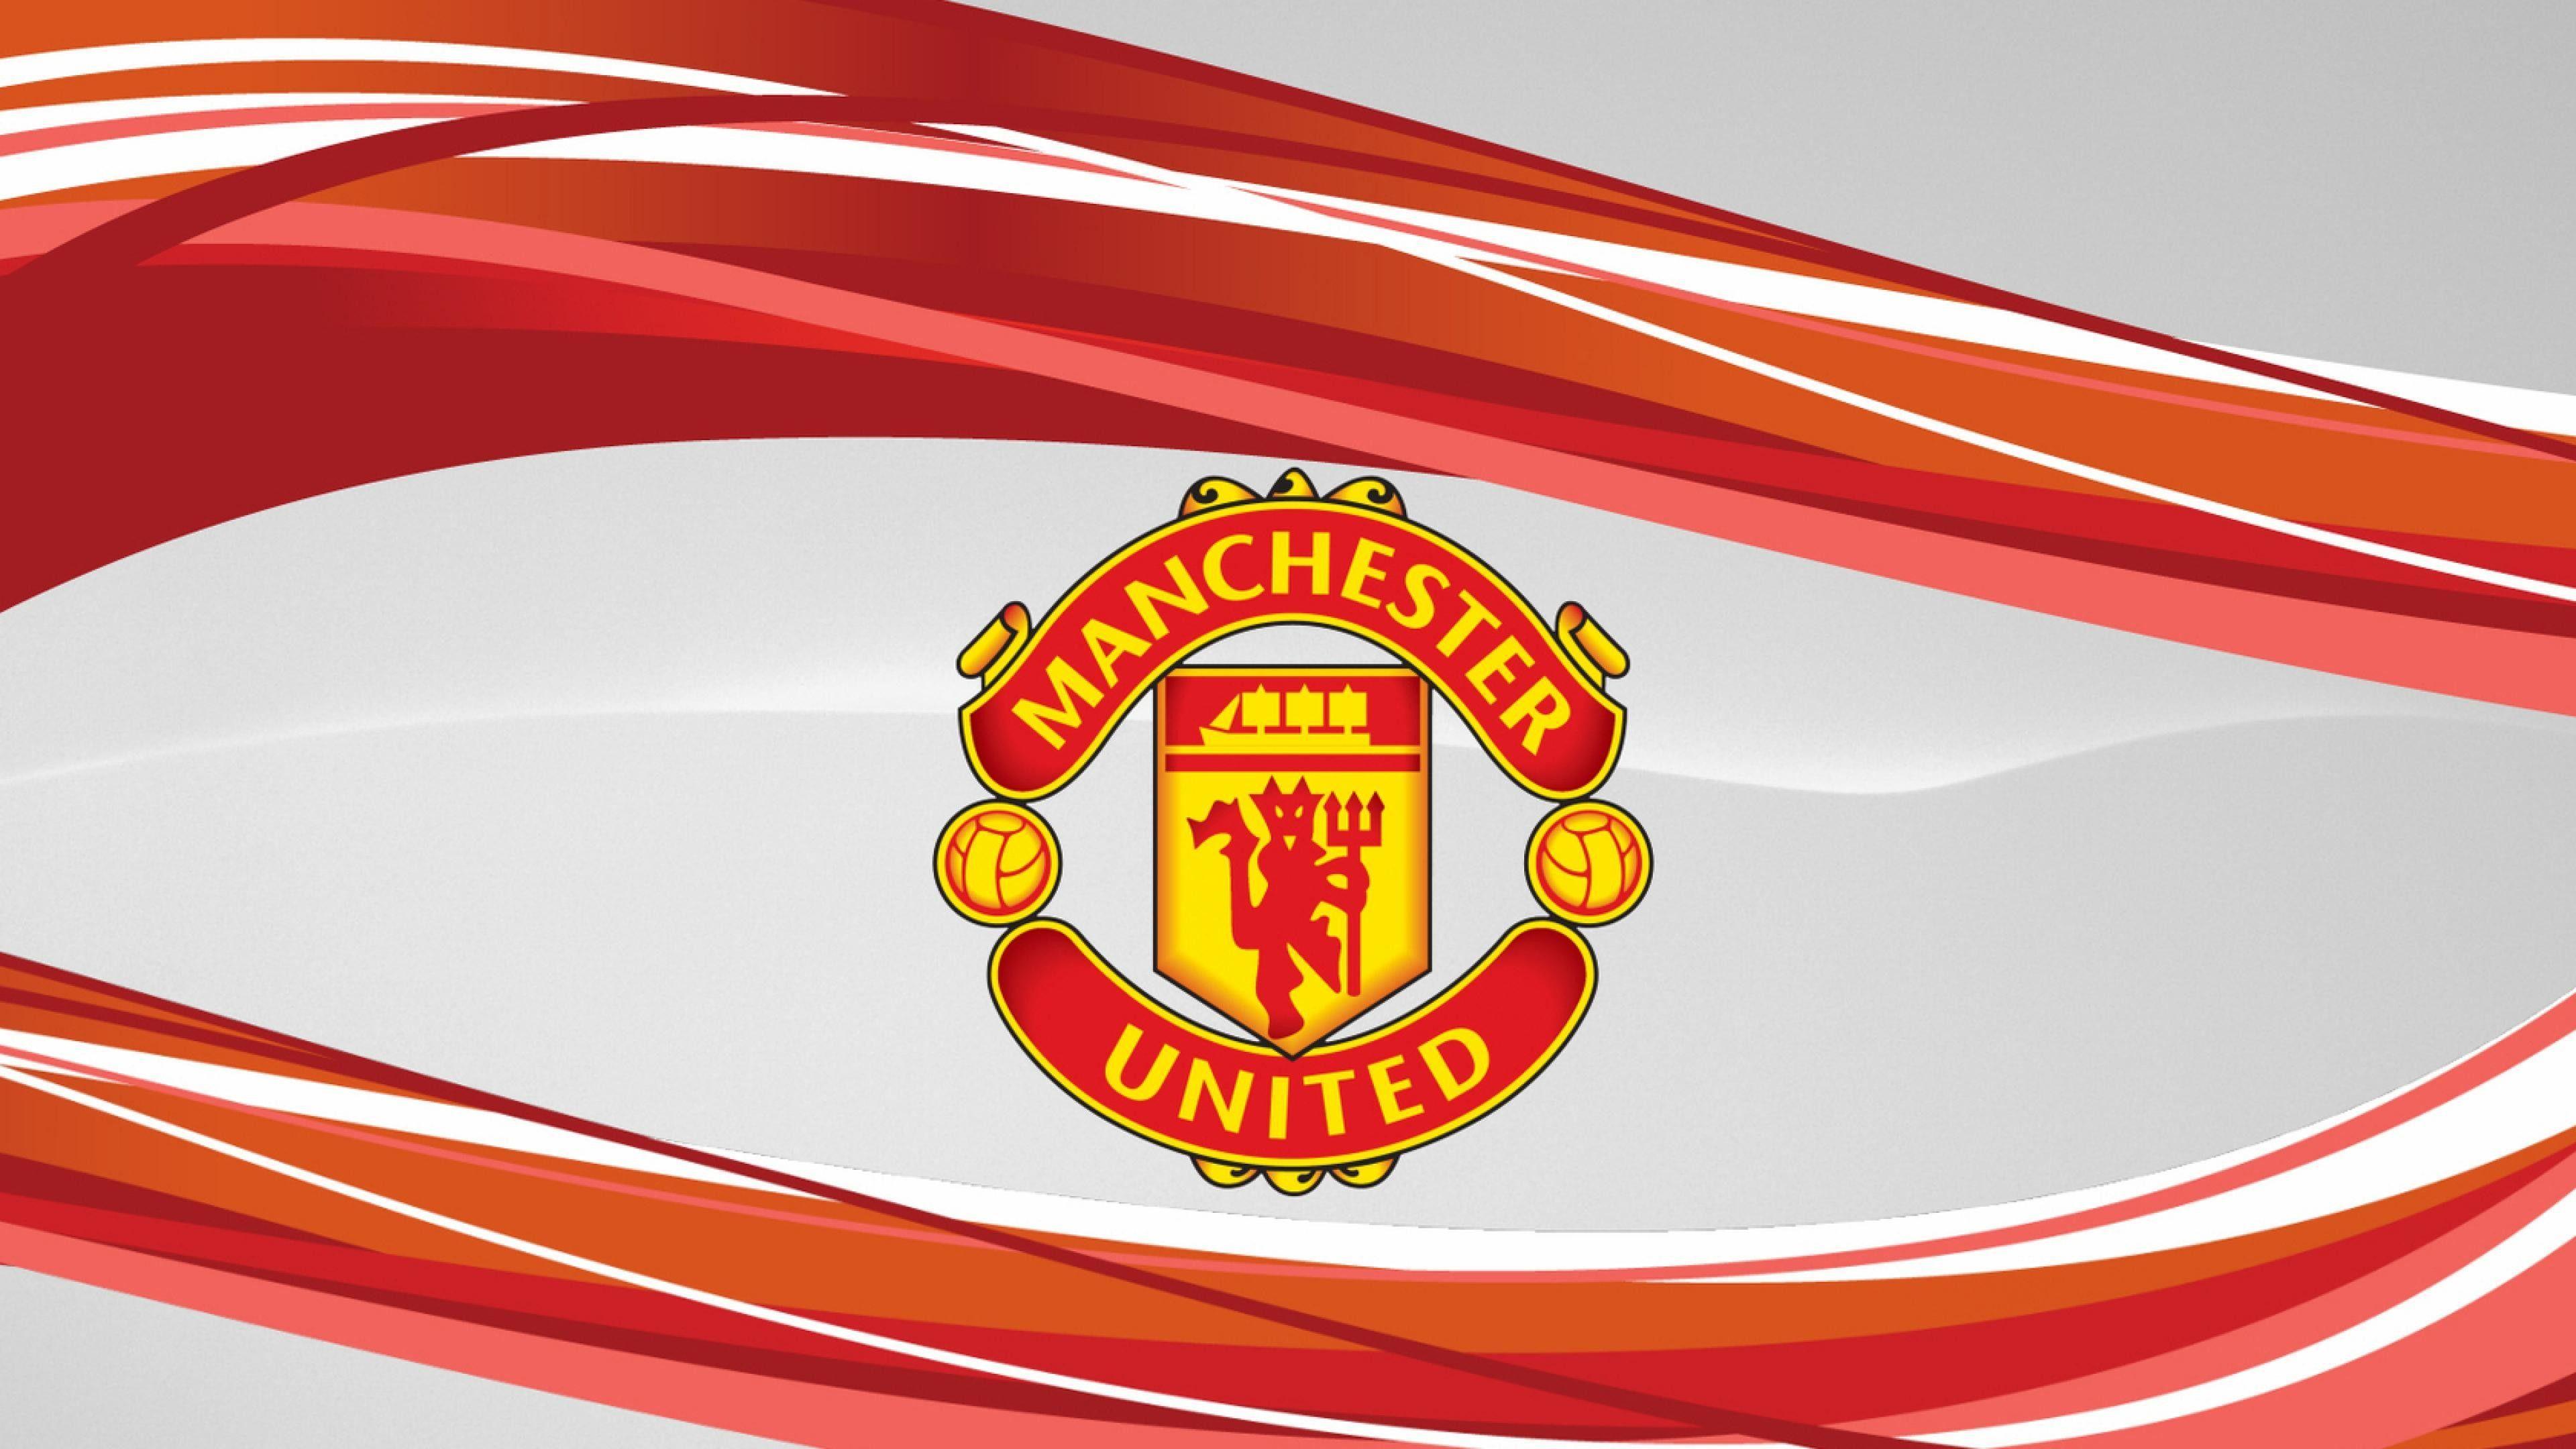 Man Utd Wallpapers Top Free Man Utd Backgrounds Wallpaperaccess